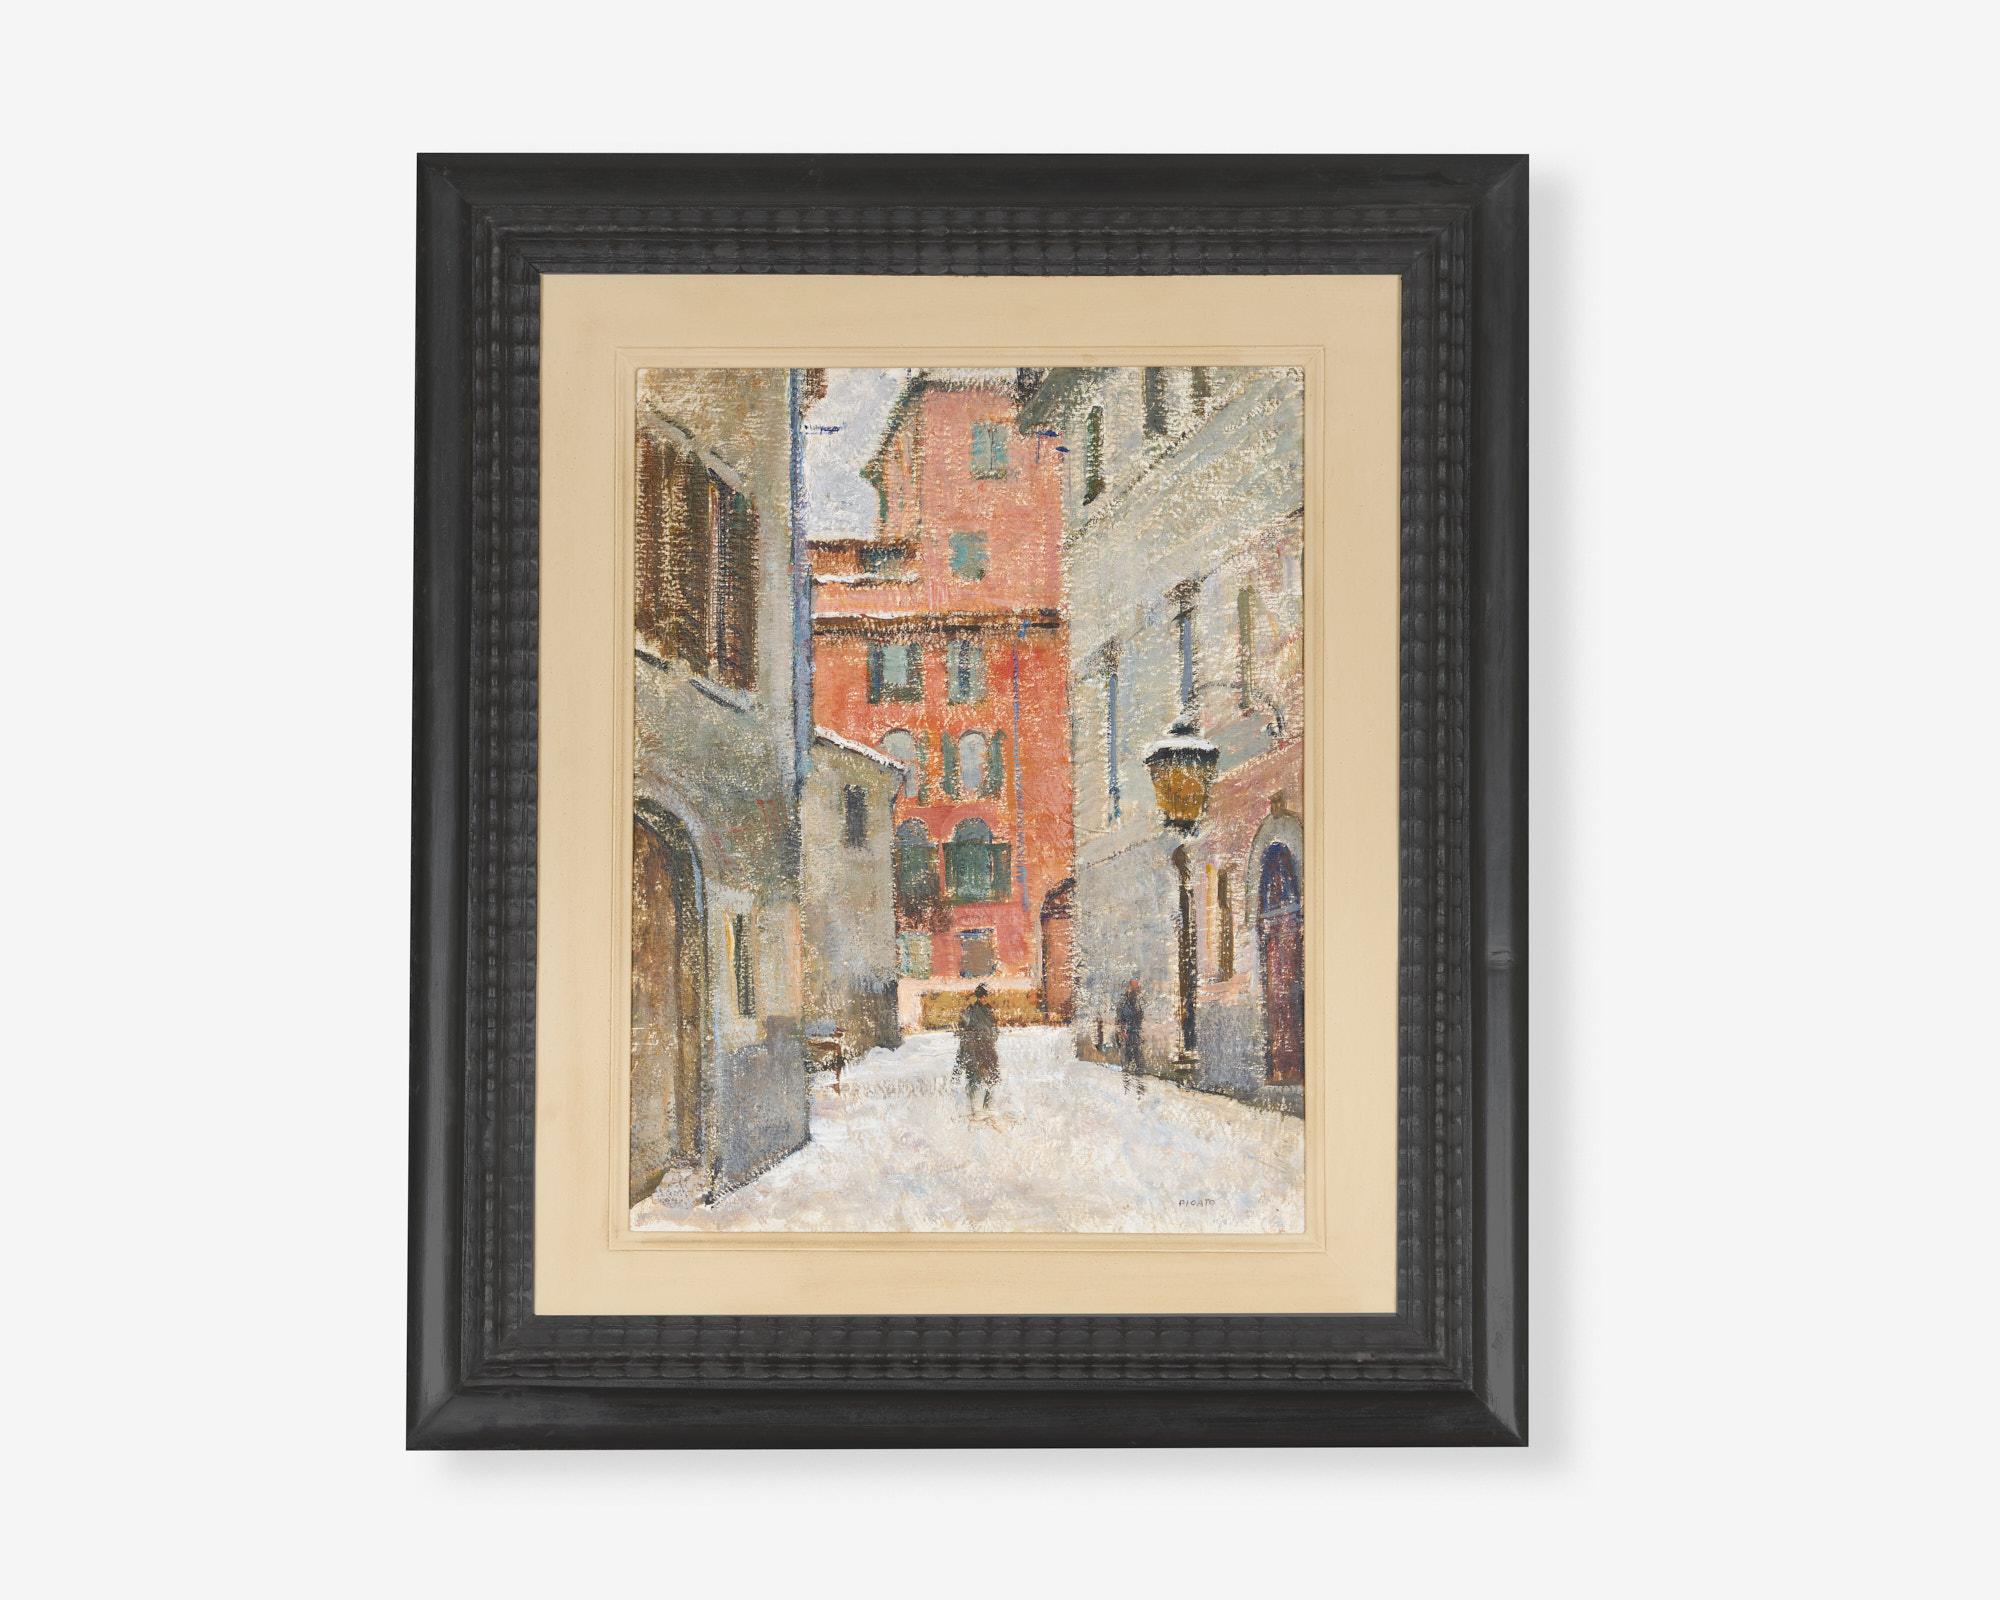 Orazio-Pigato_Neve-Verona-faraci-arte-verona